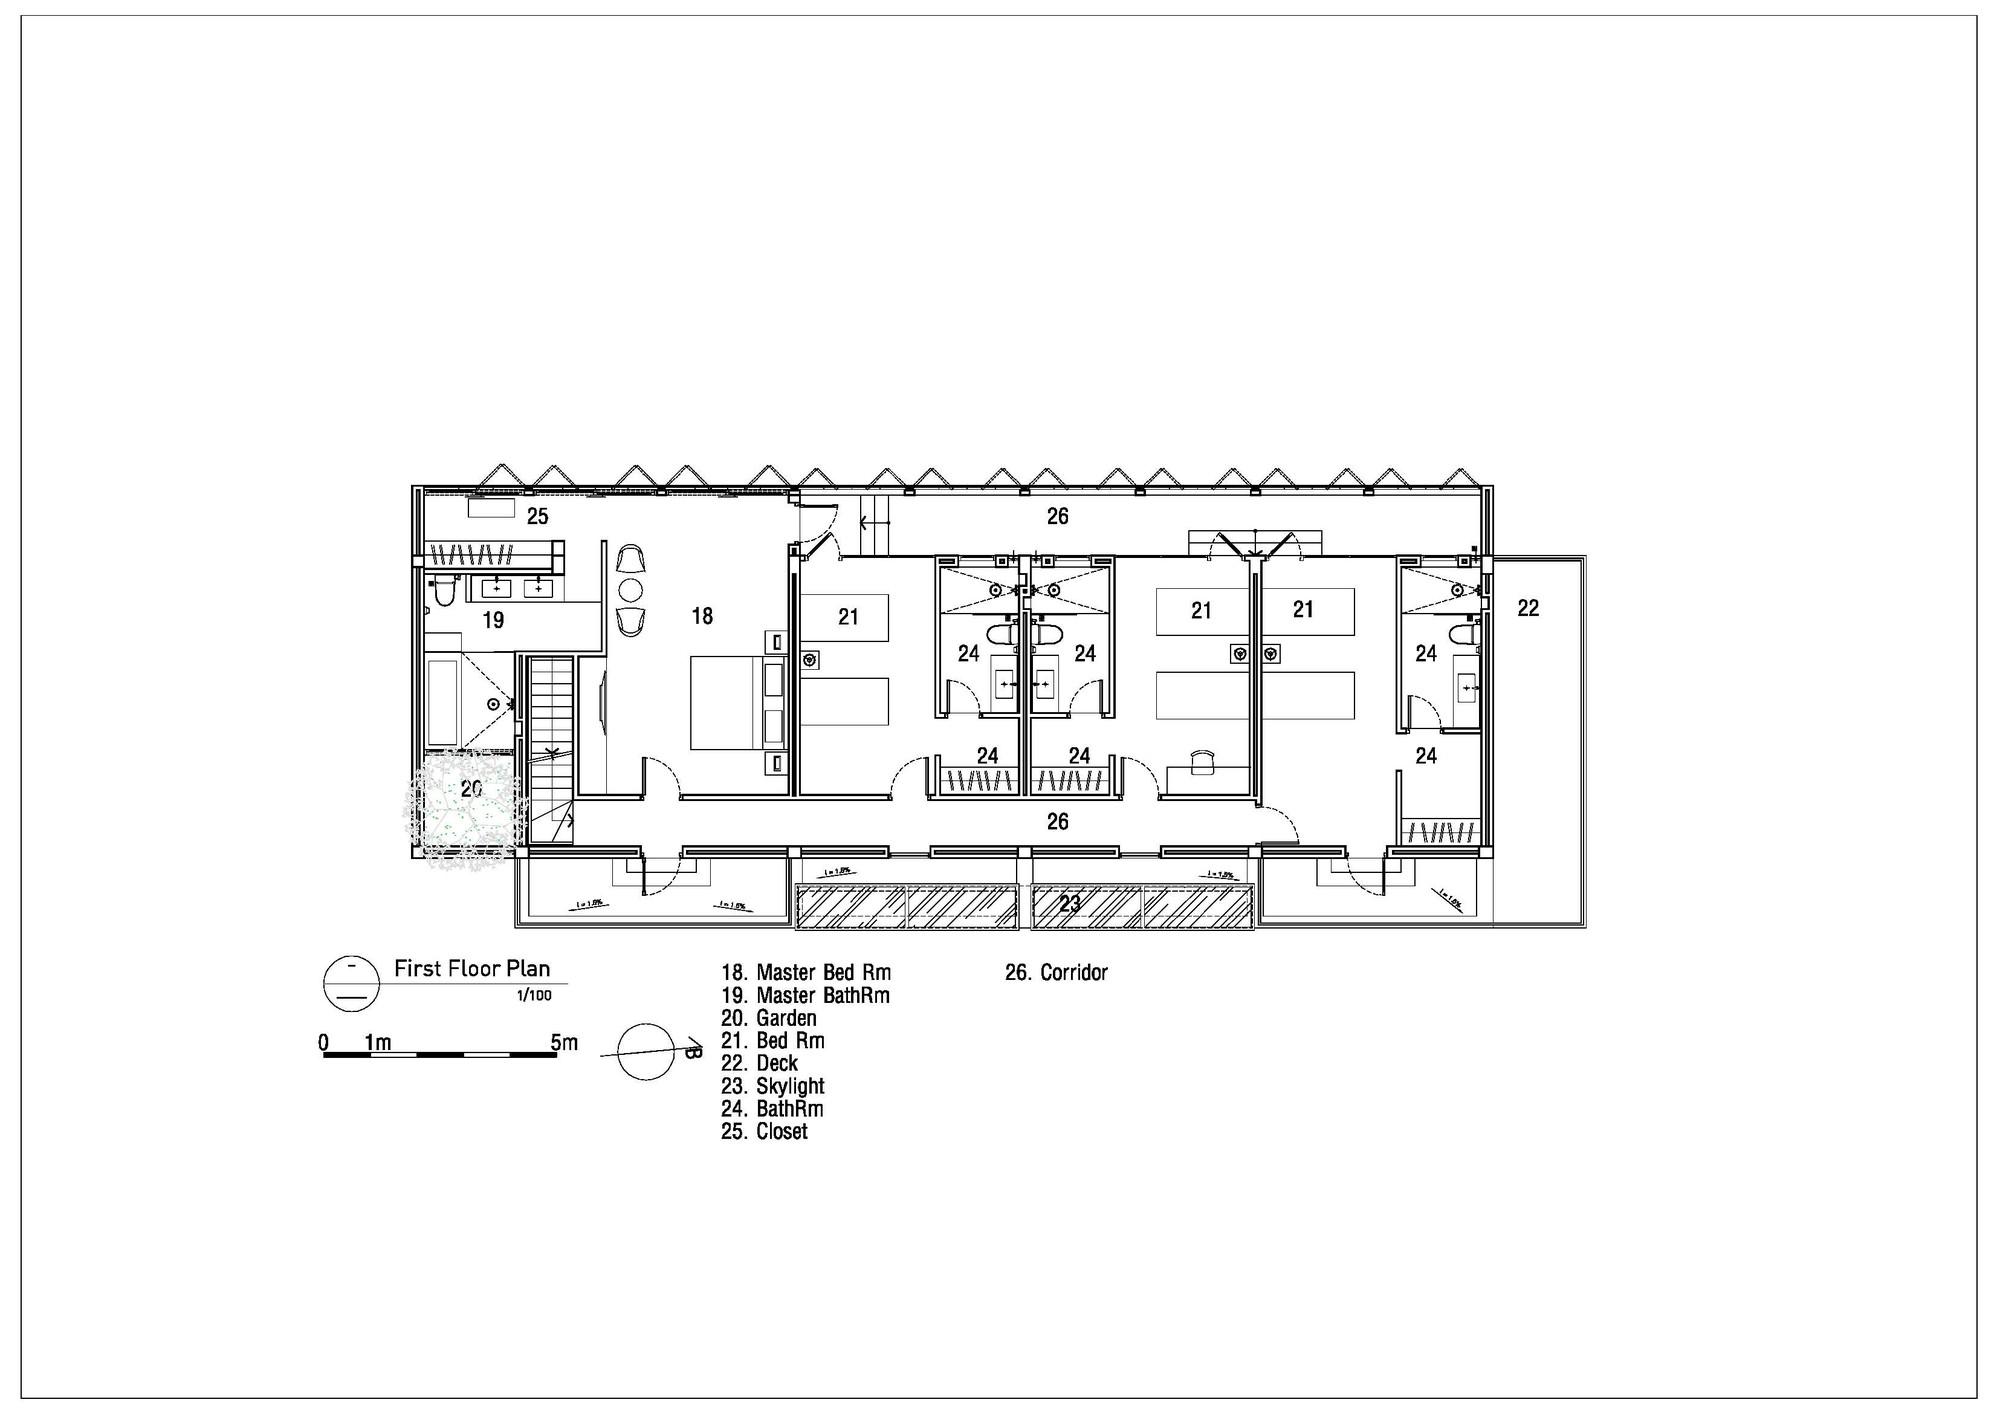 Gallery Of House 81 Mimanystudio Realarchitecture 19 2006 Honda Crv Fuse Box Diagram 81first Floor Plan